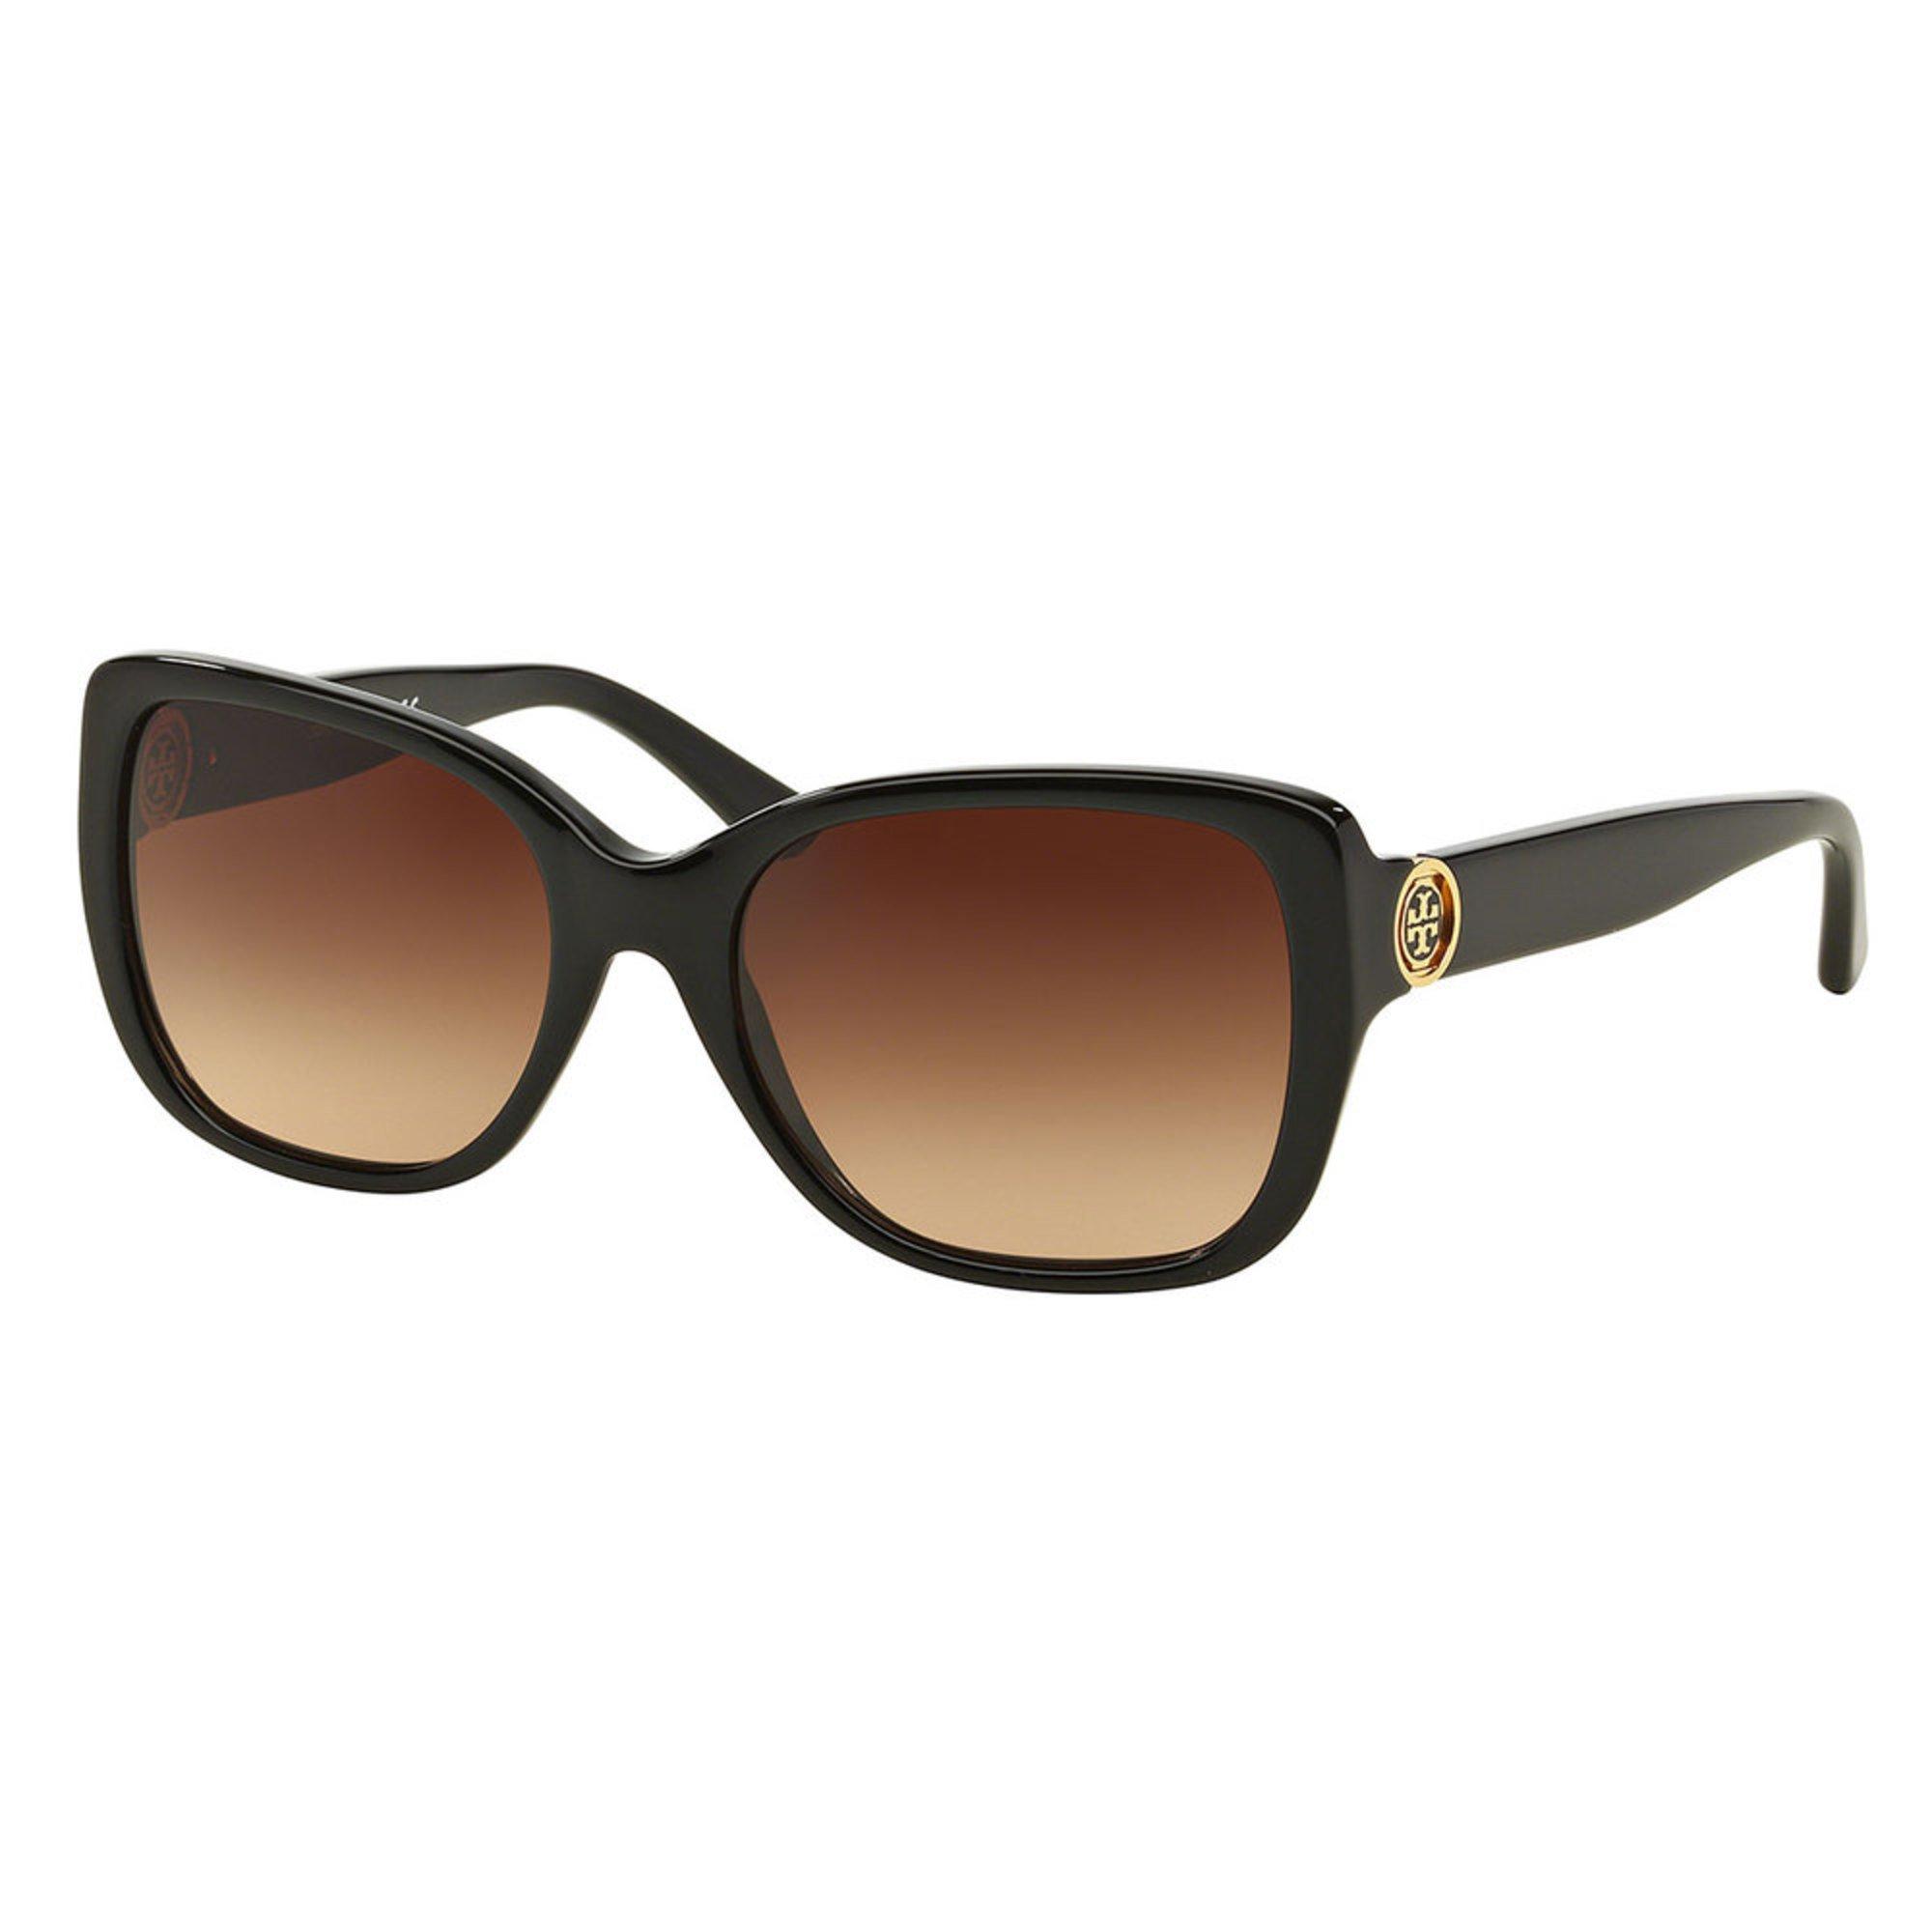 6660992106 Tory Burch. Tory Burch Women s Square Sunglasses